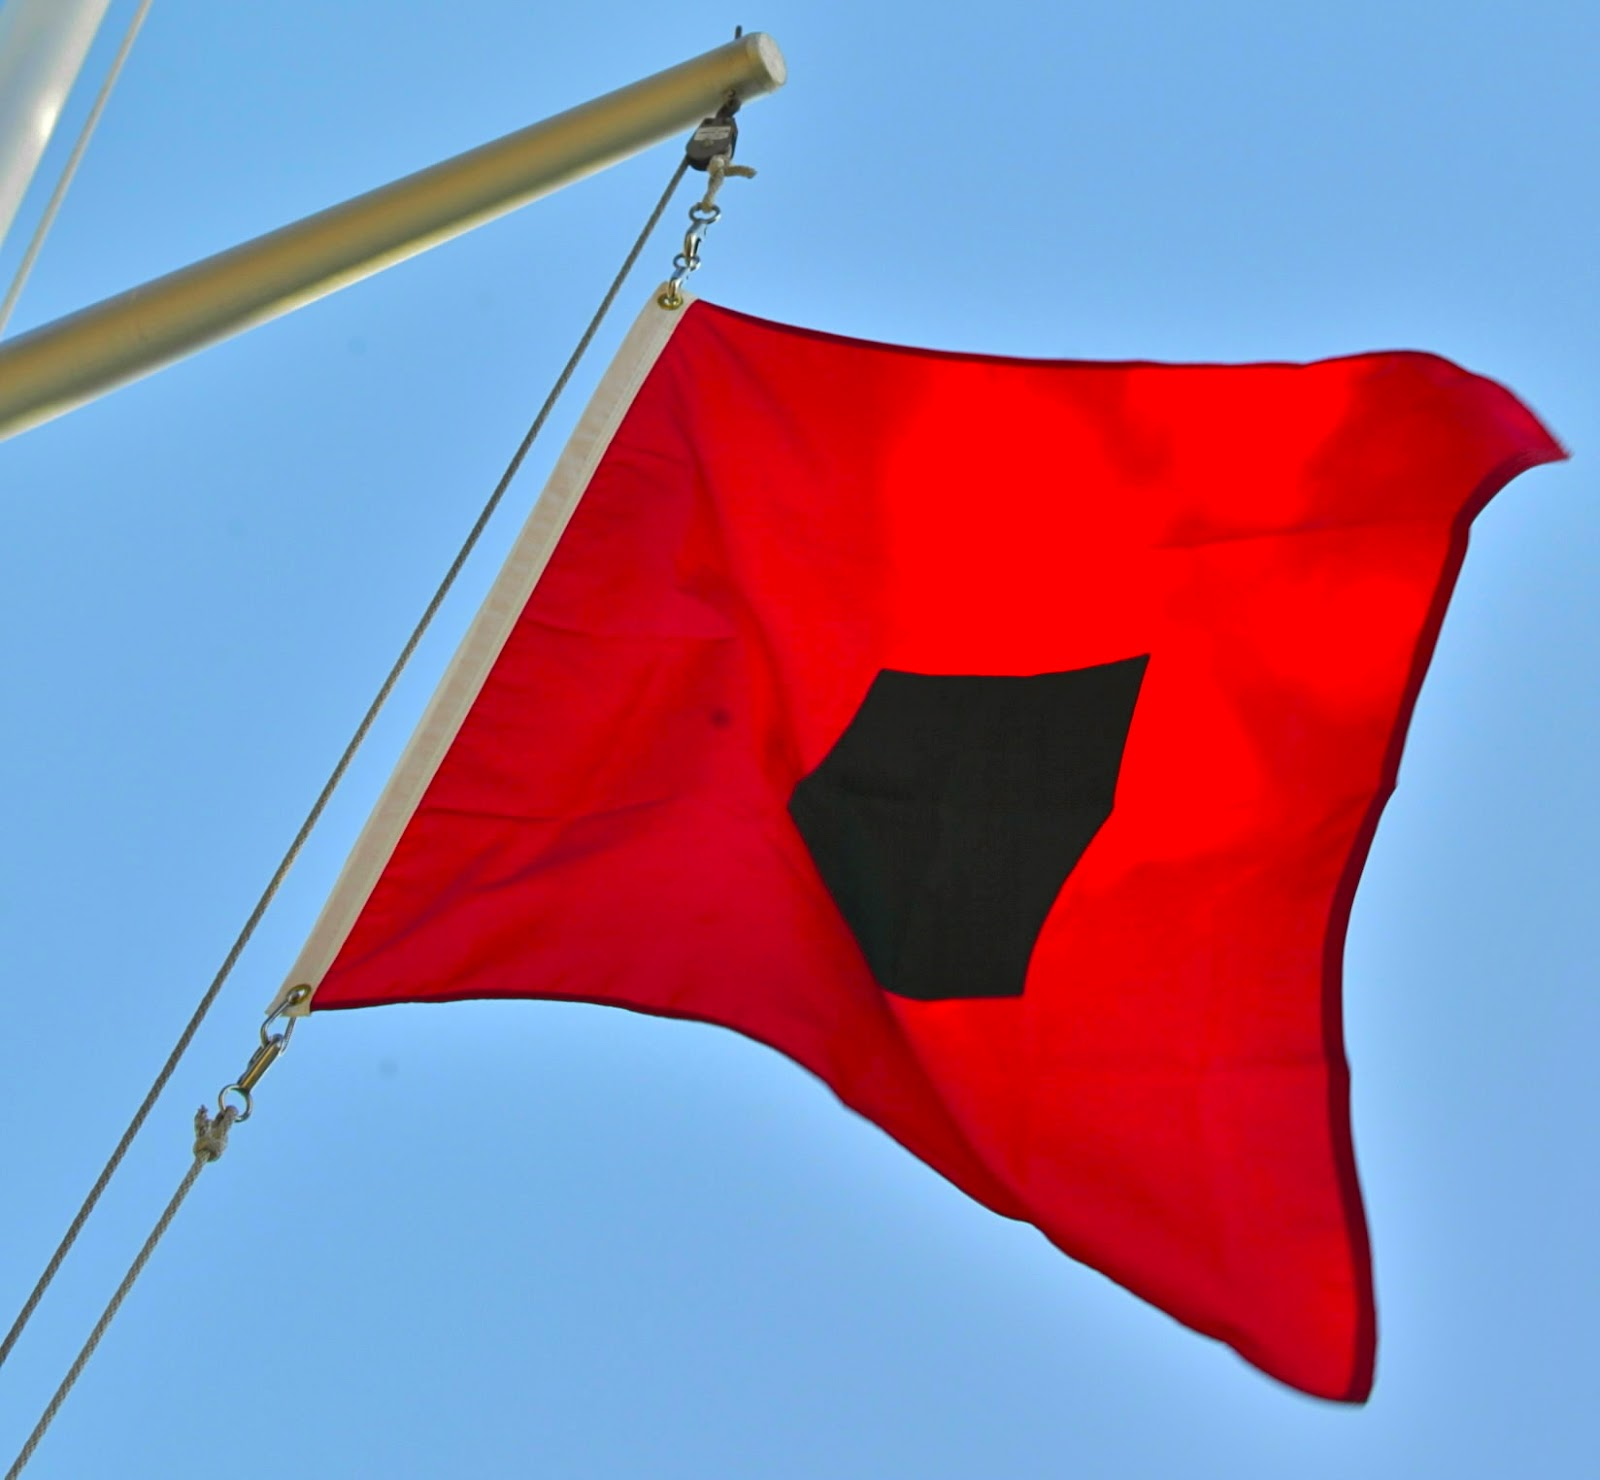 hurricane warning flag